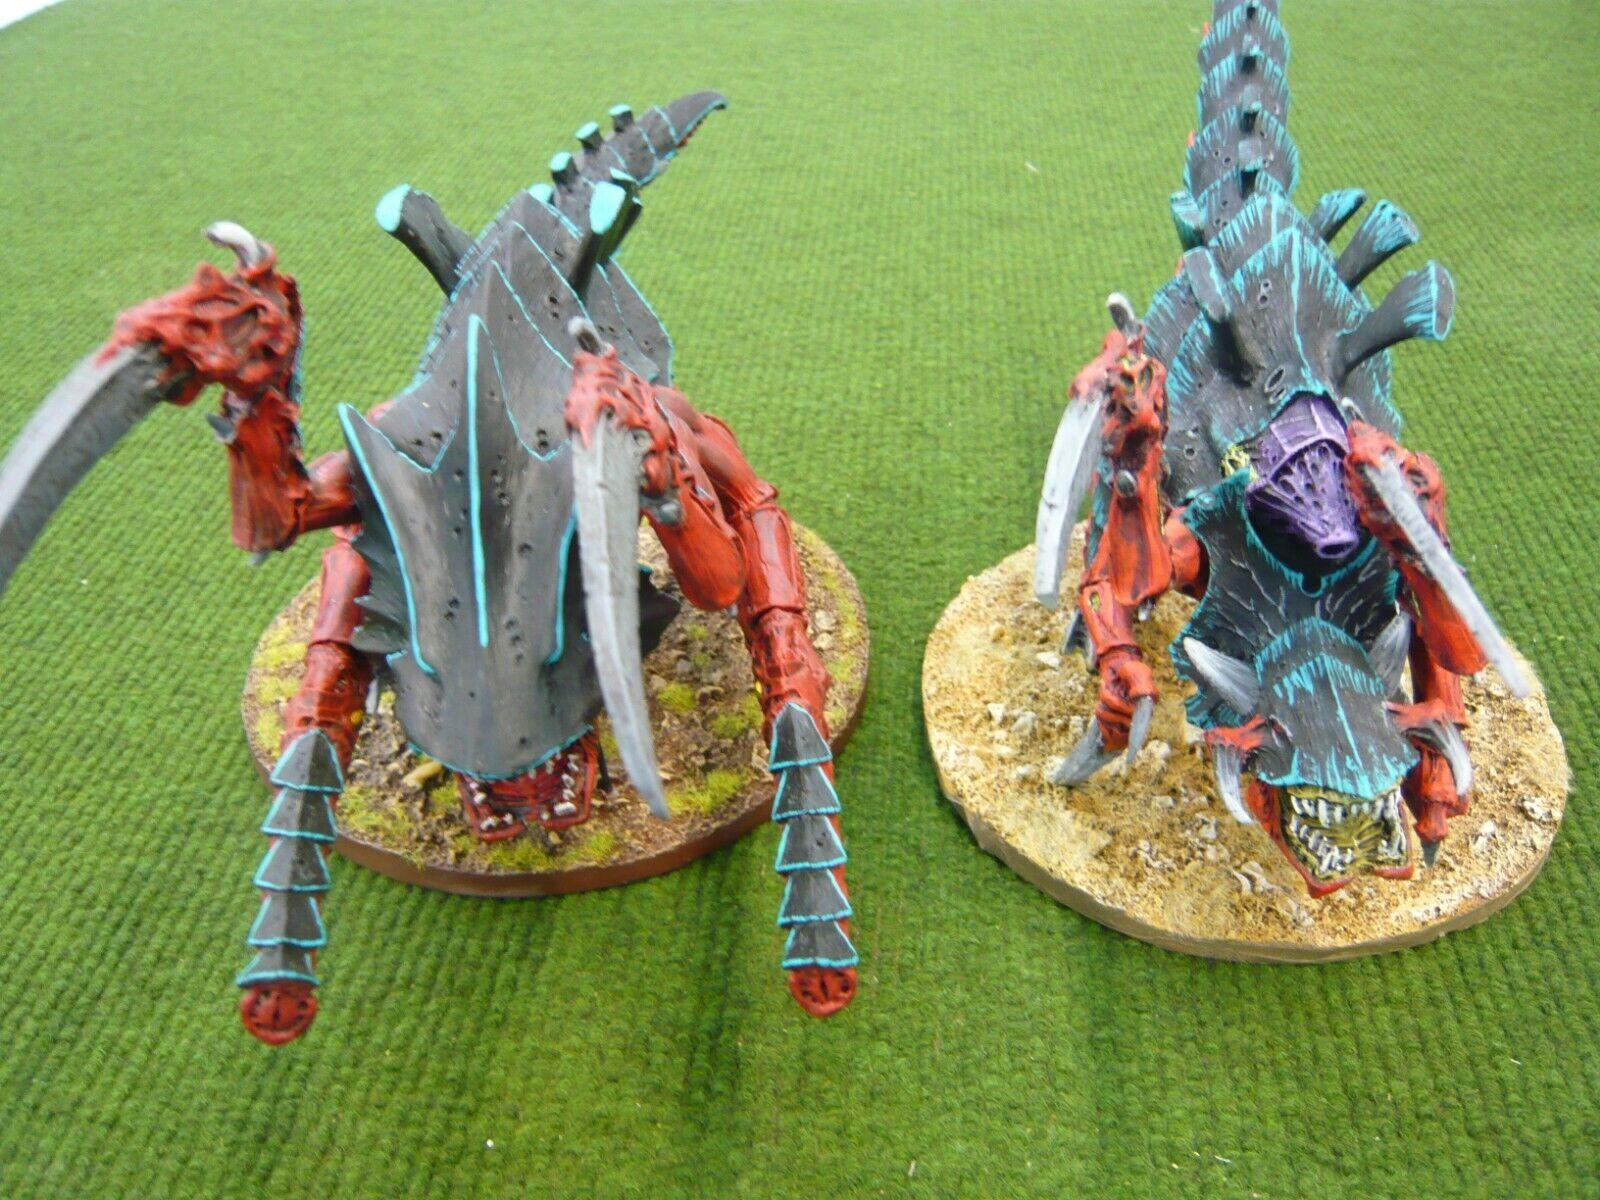 Warhammer 40k Forgeworld Tyranid Hierodules Painted (2  modellolololos)  tempo libero